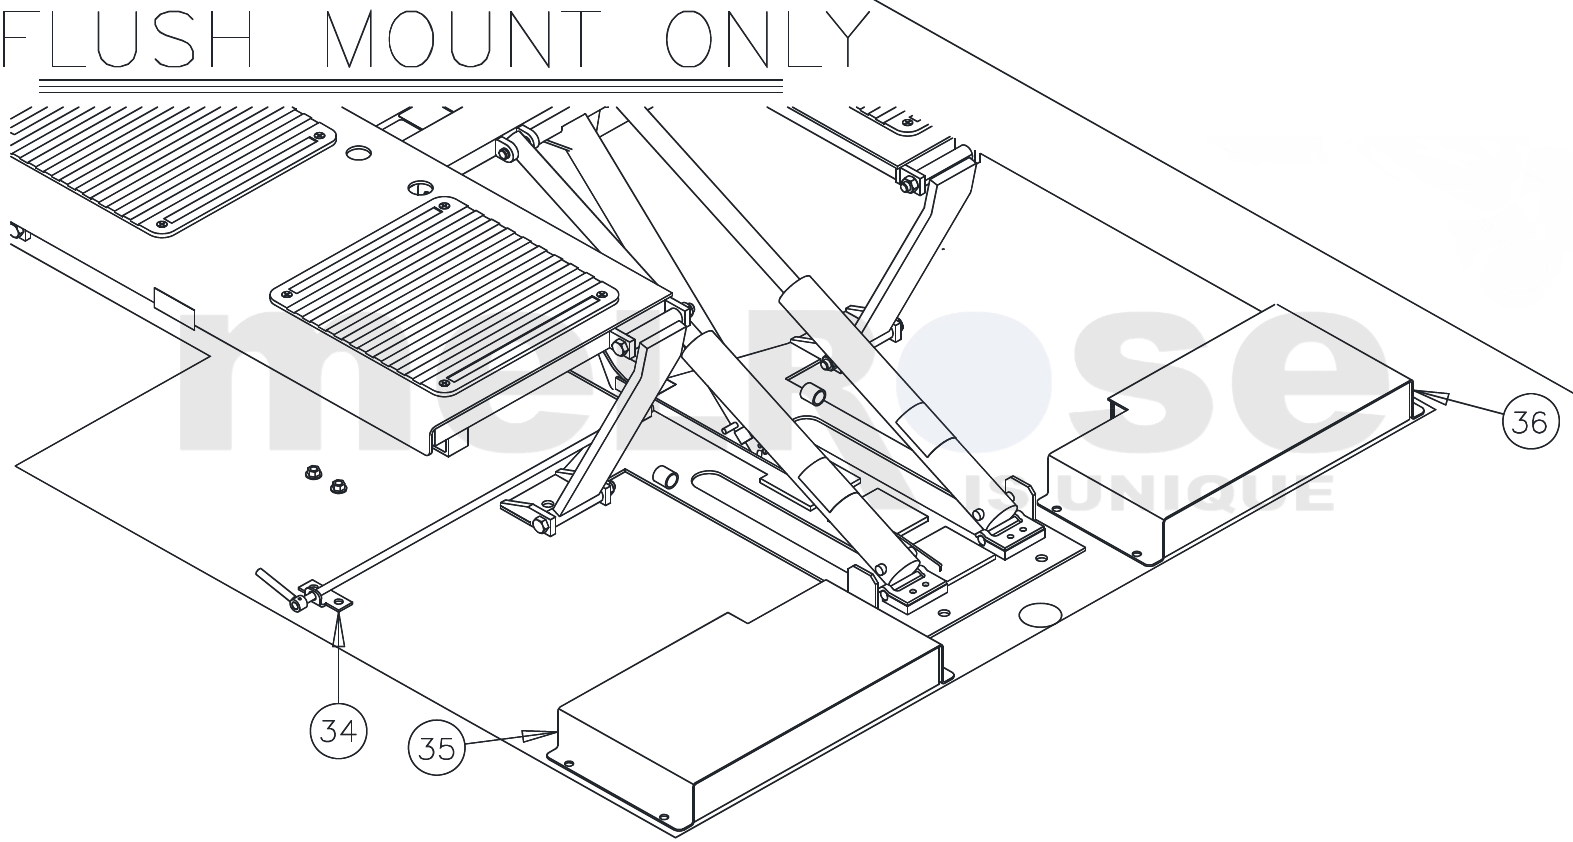 srm10-flush-mount-only-diagram-marked.jpg